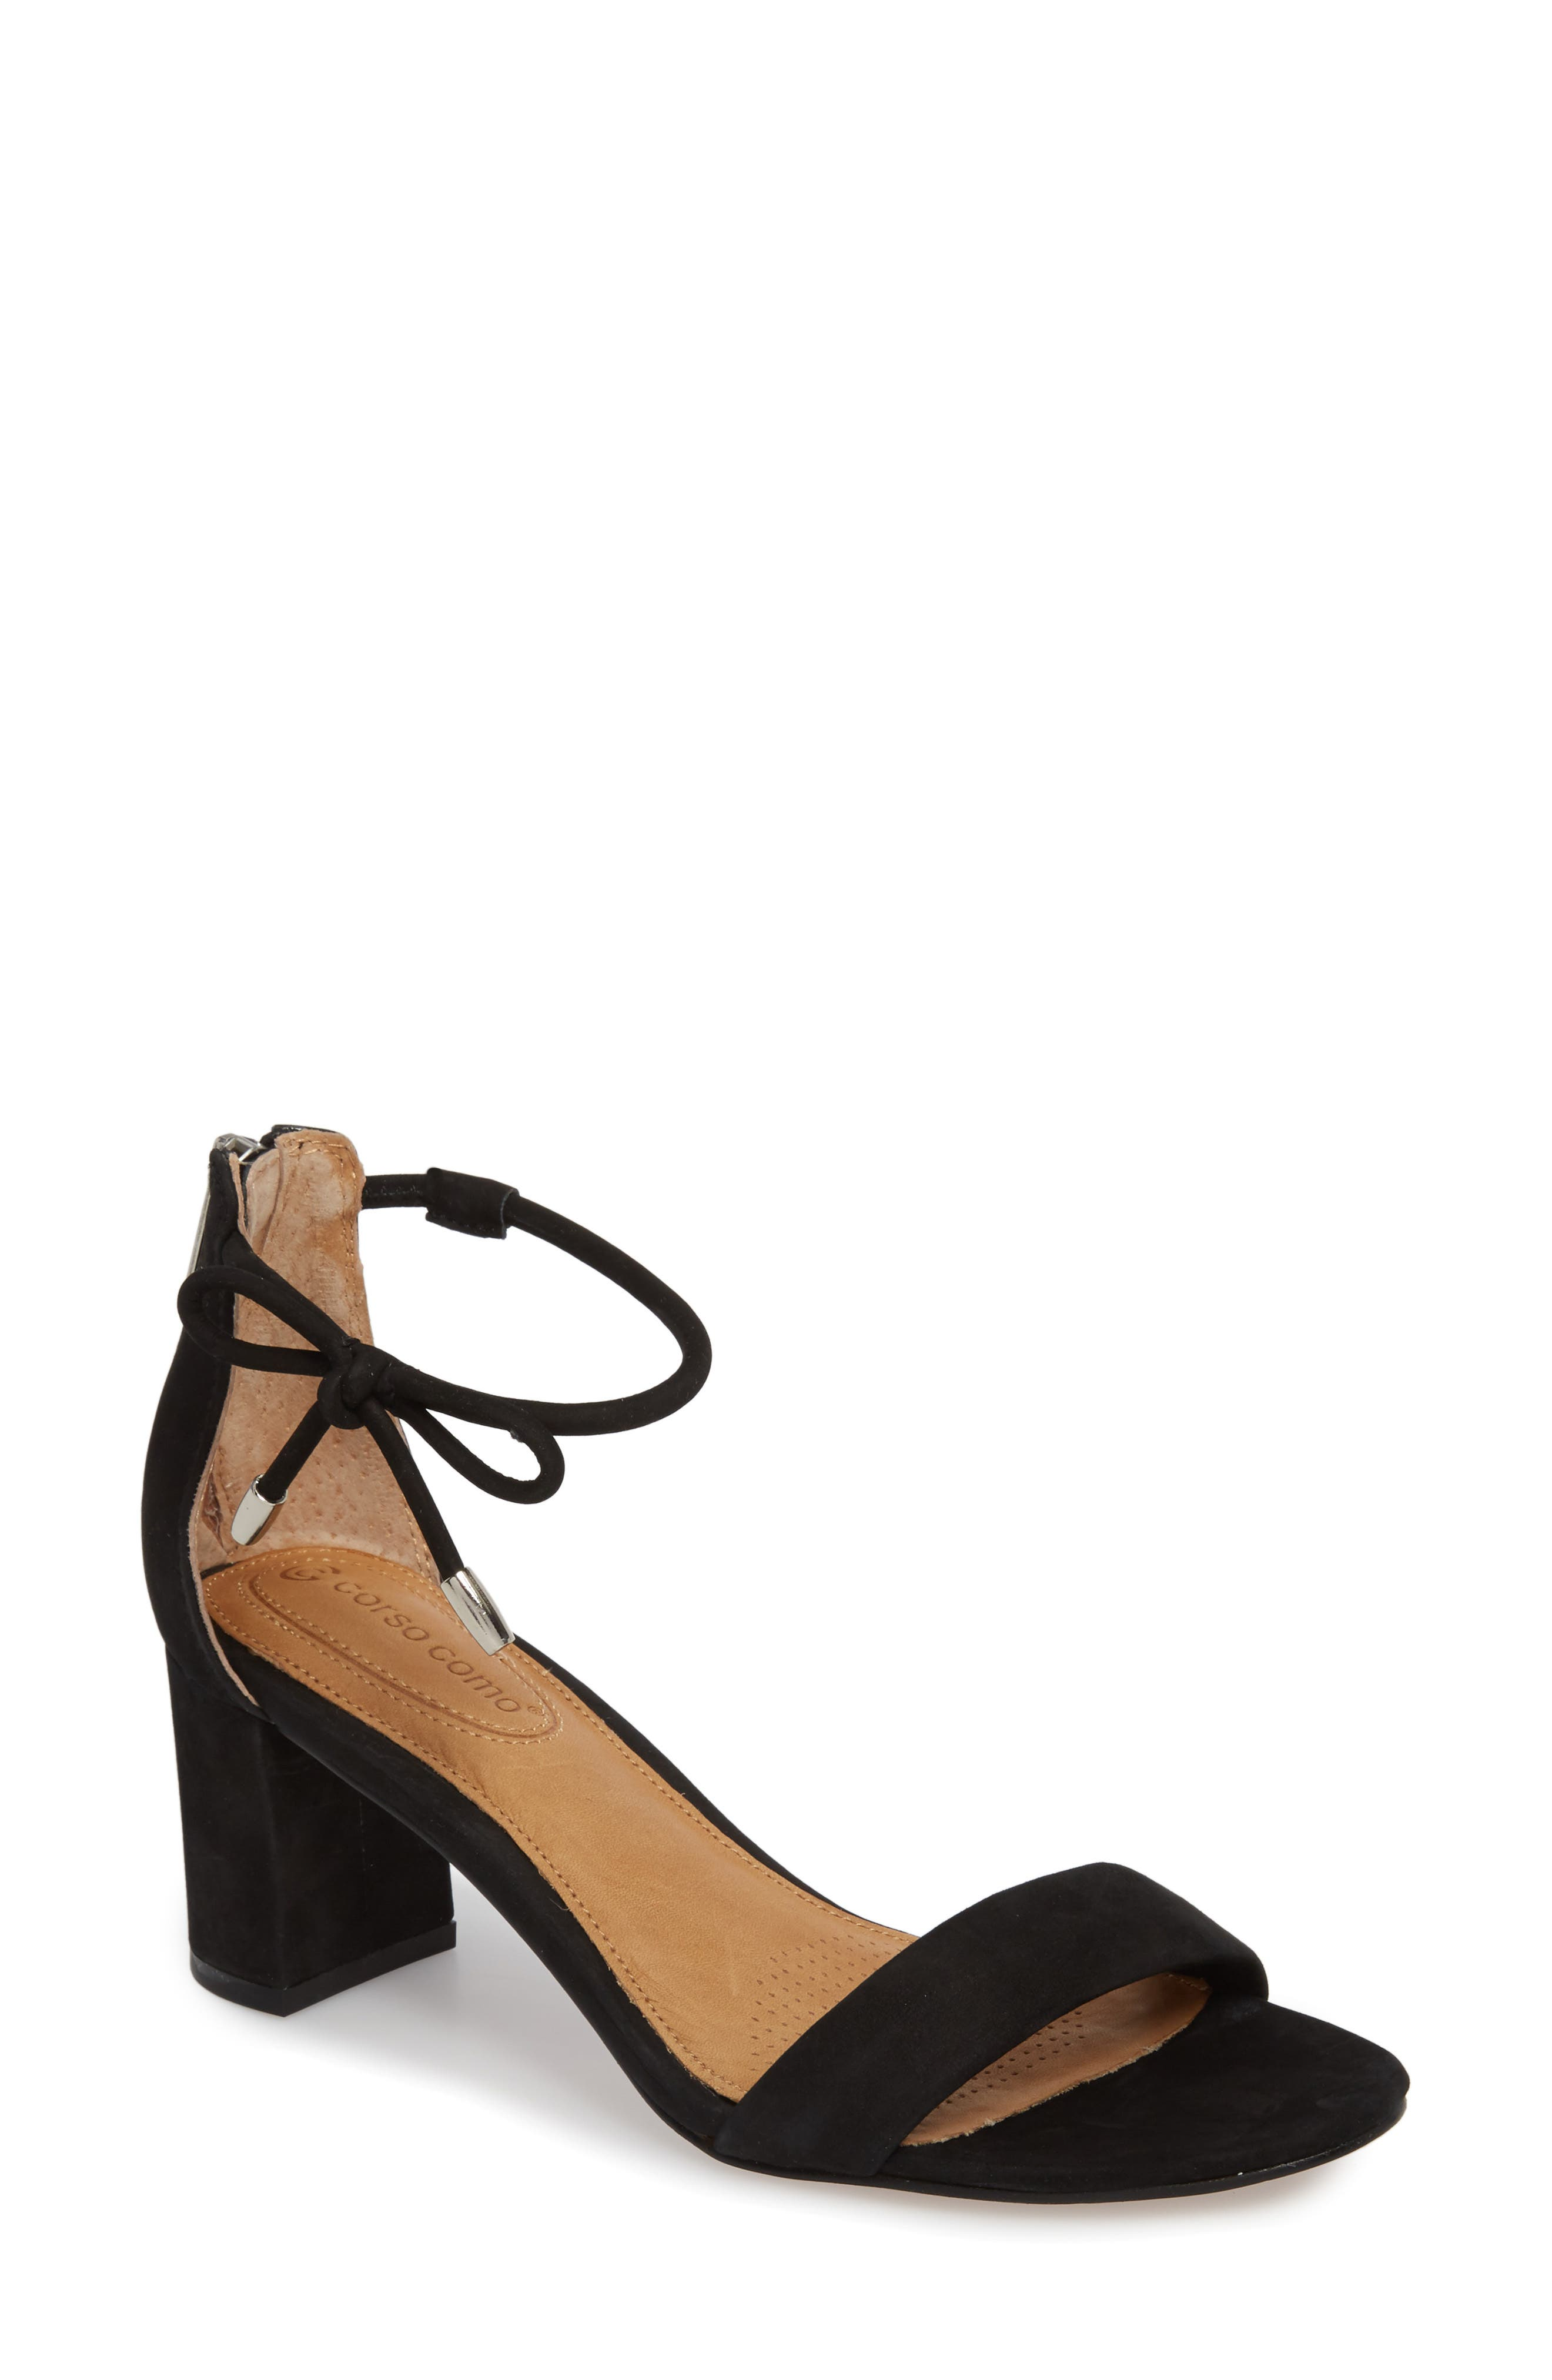 Celebratt Ankle Strap Sandal,                             Main thumbnail 1, color,                             001